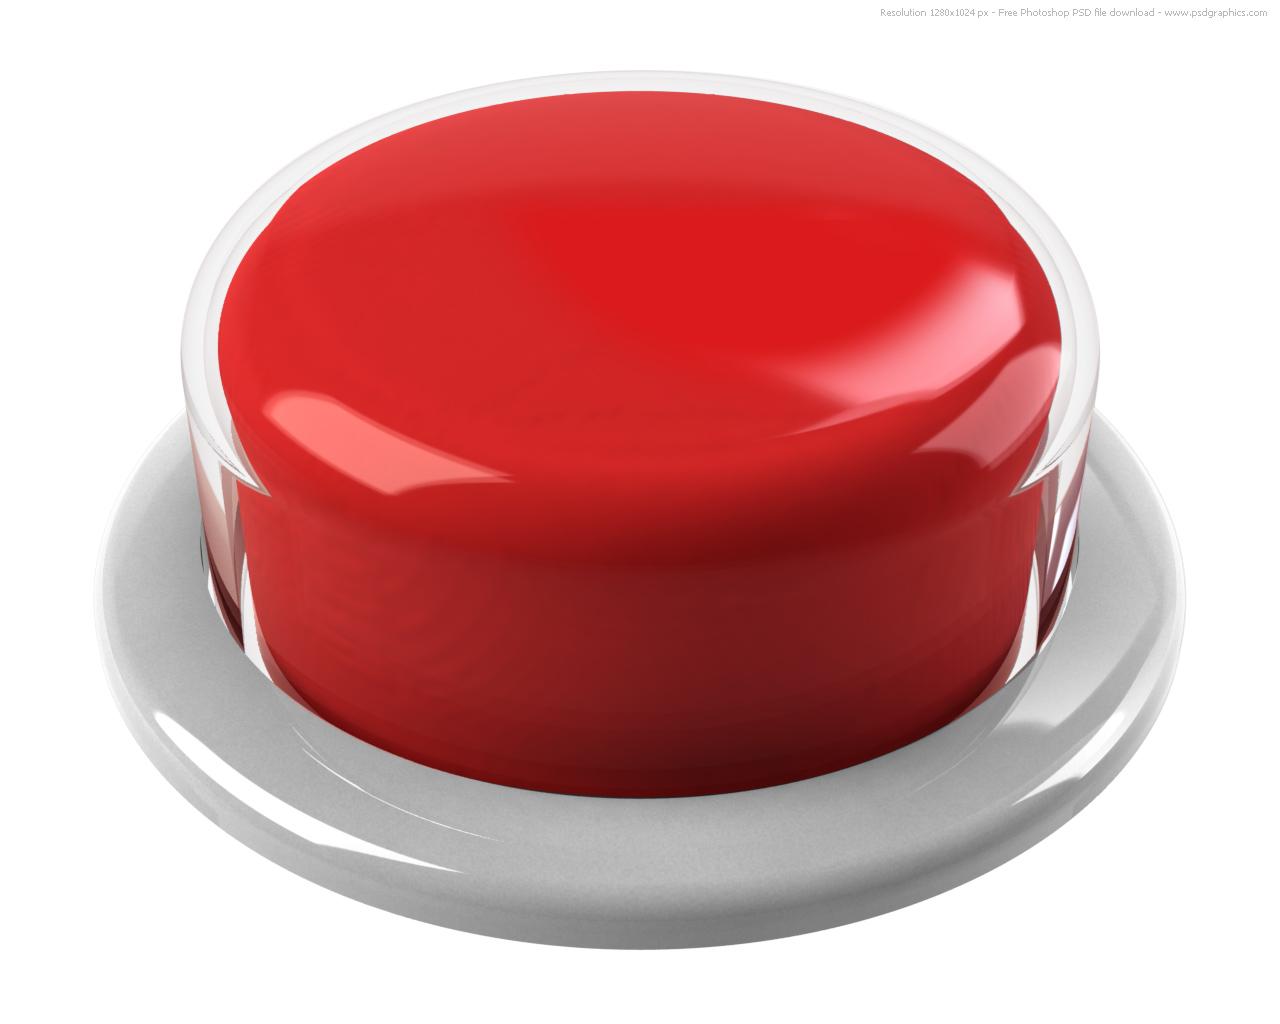 3d-red-button.jpg&sa=X&ei=znnJTcvhMcvsOYbgxNkH&ved=0CAQQ8wc&usg=AFQjCNGo8zfFQTtdBDA8DEtDOjmKSQn_4g